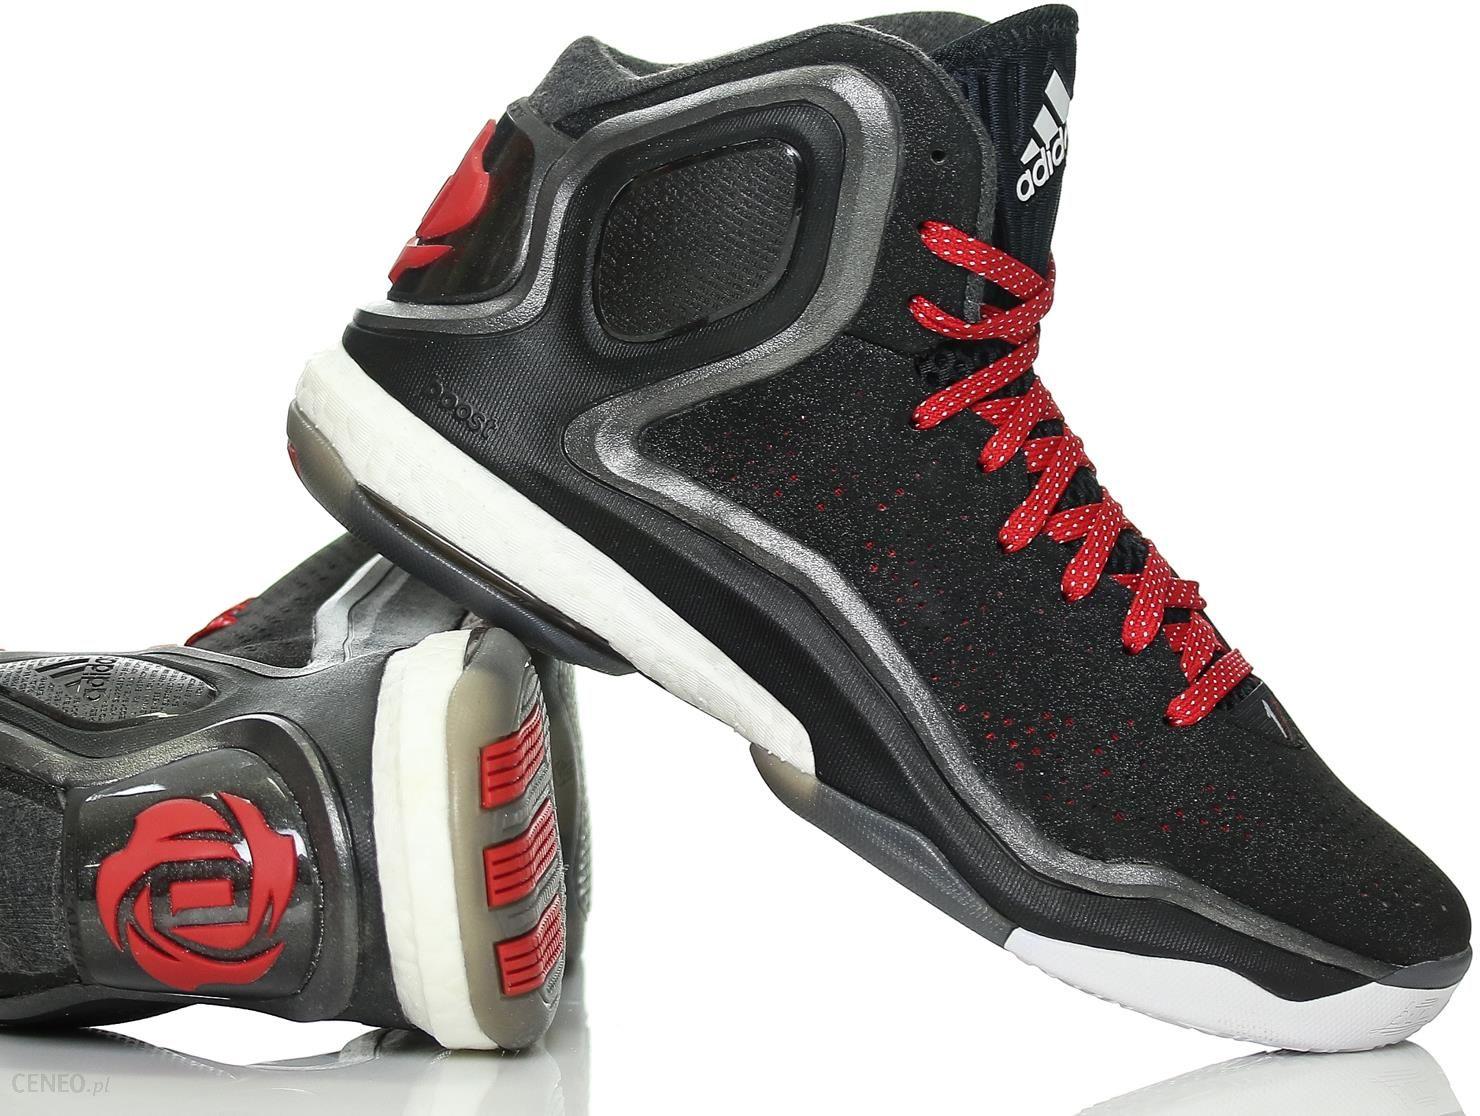 free shipping acf85 52d90 Buty męskie Adidas D Rose 5 Boost G98704 R.40 23 - zdjęcie